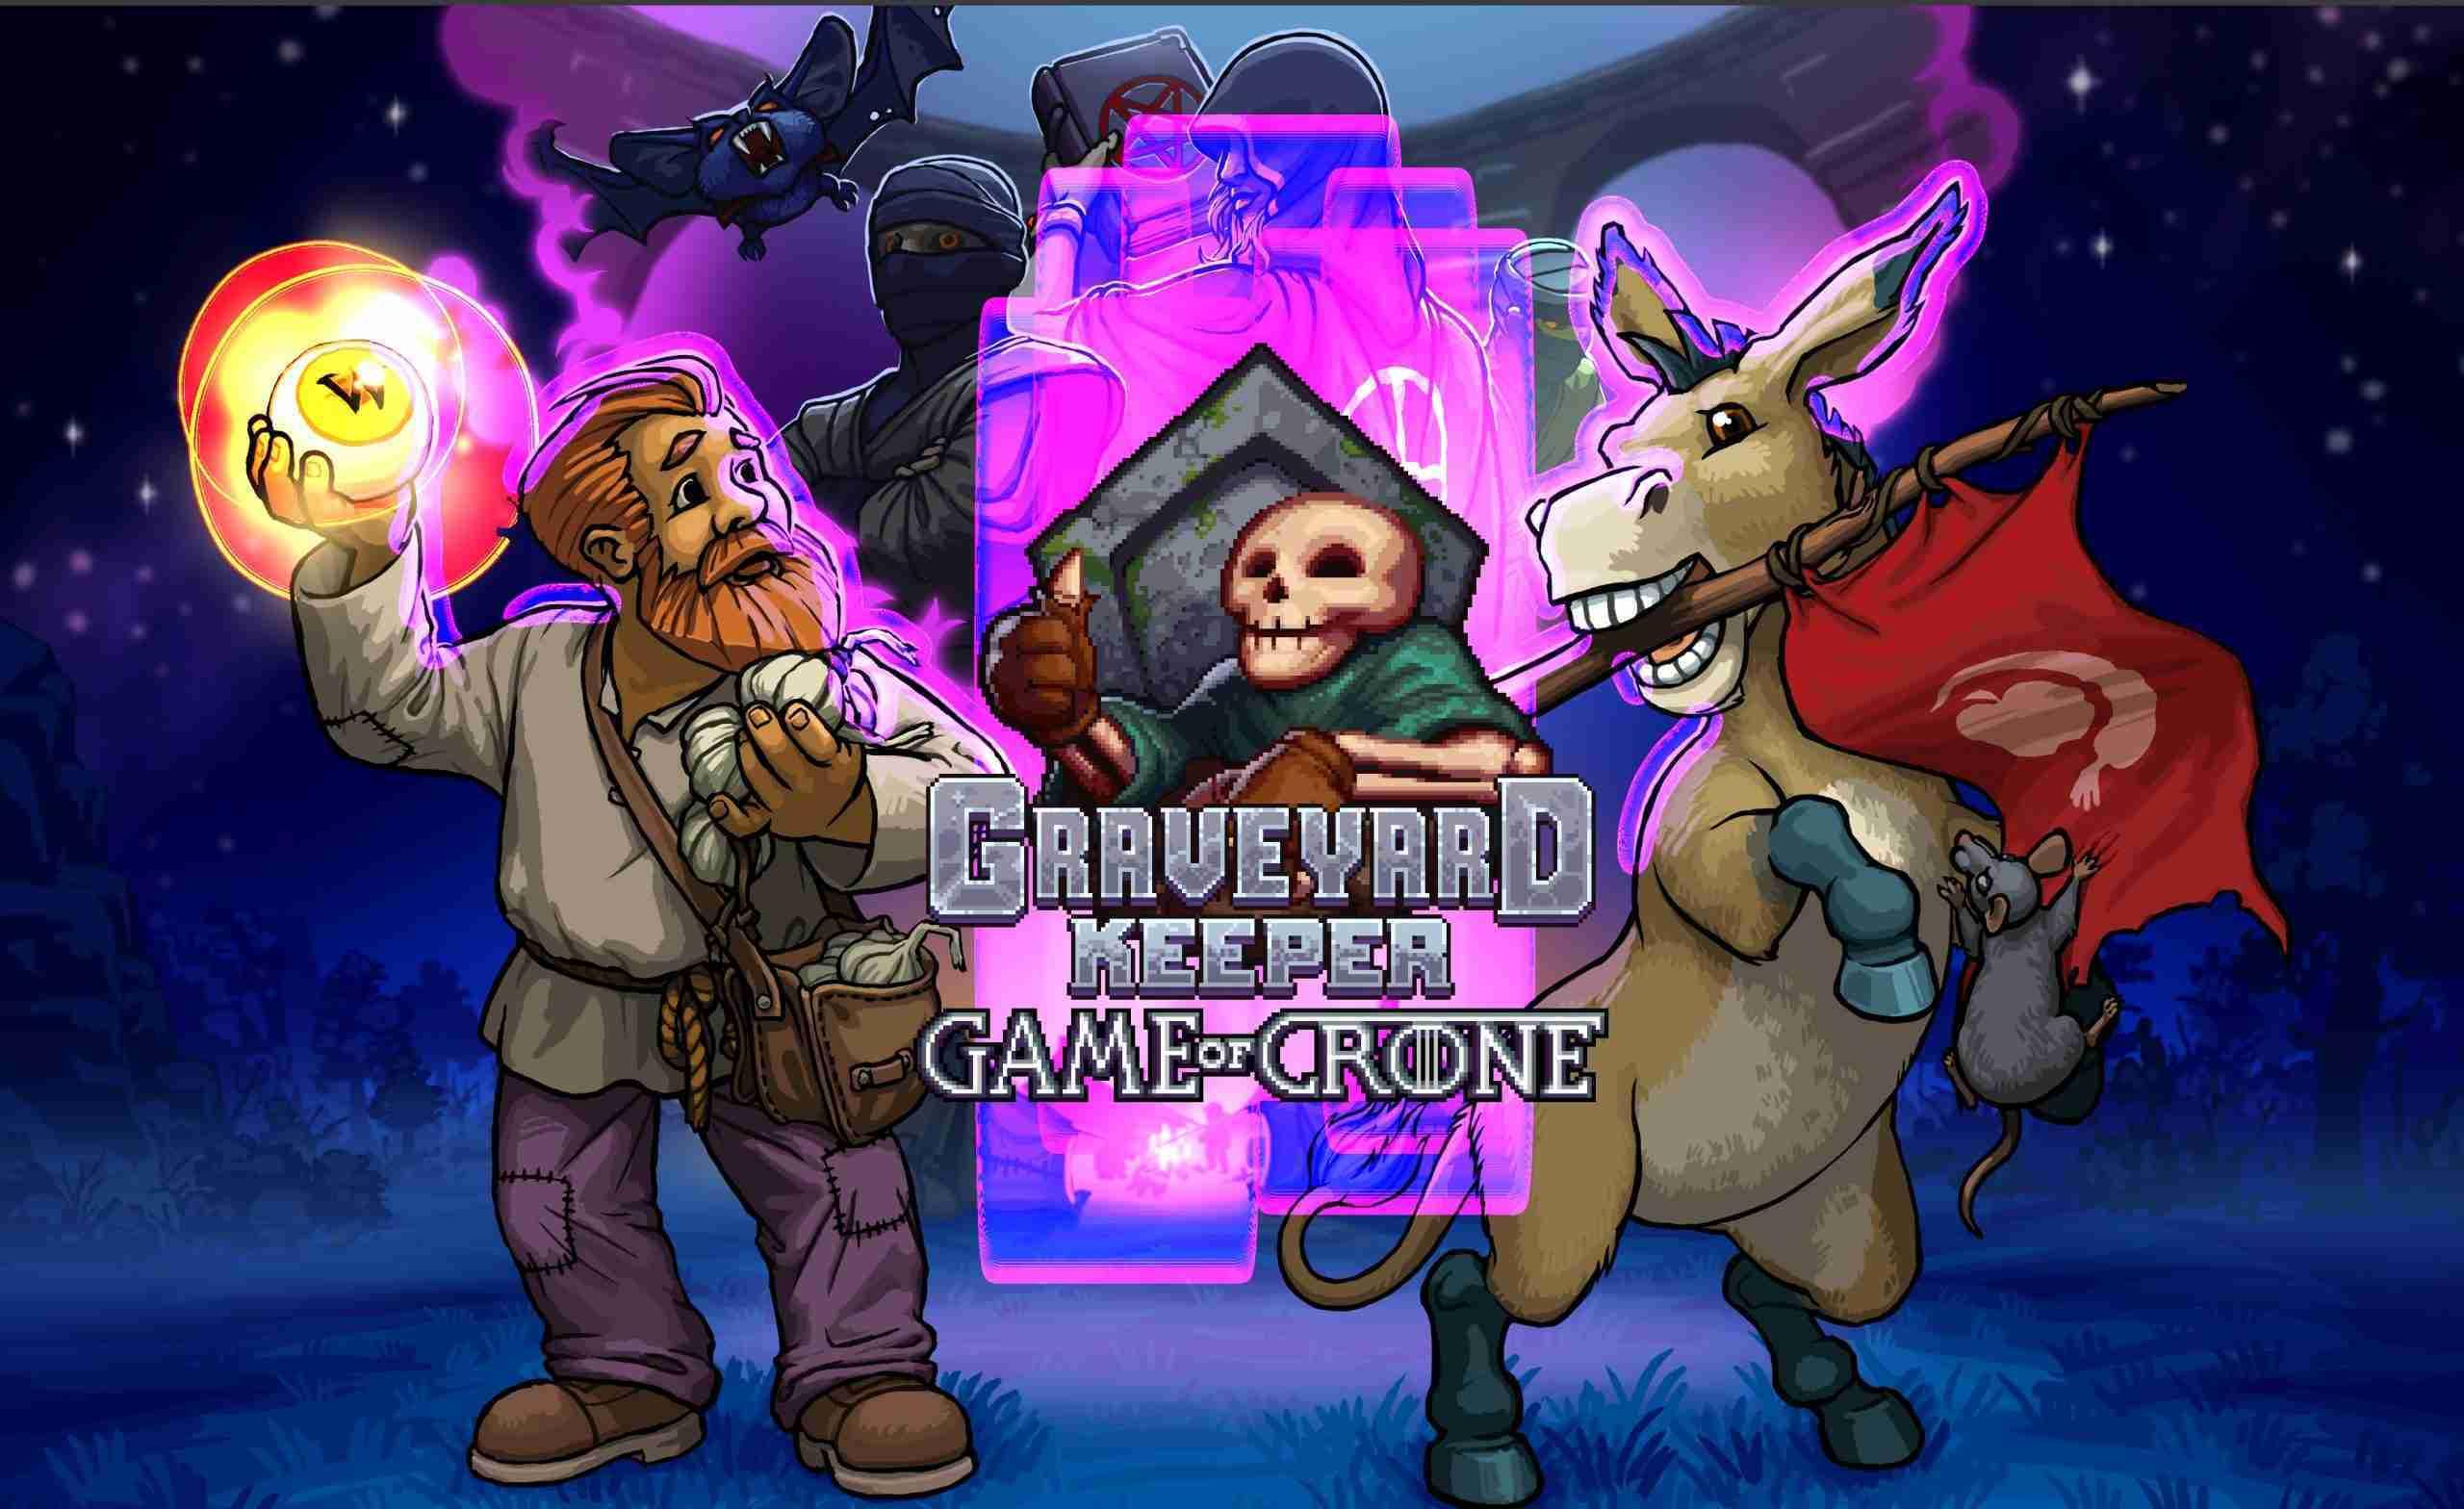 Graveyard Keeper -- Game of Crone